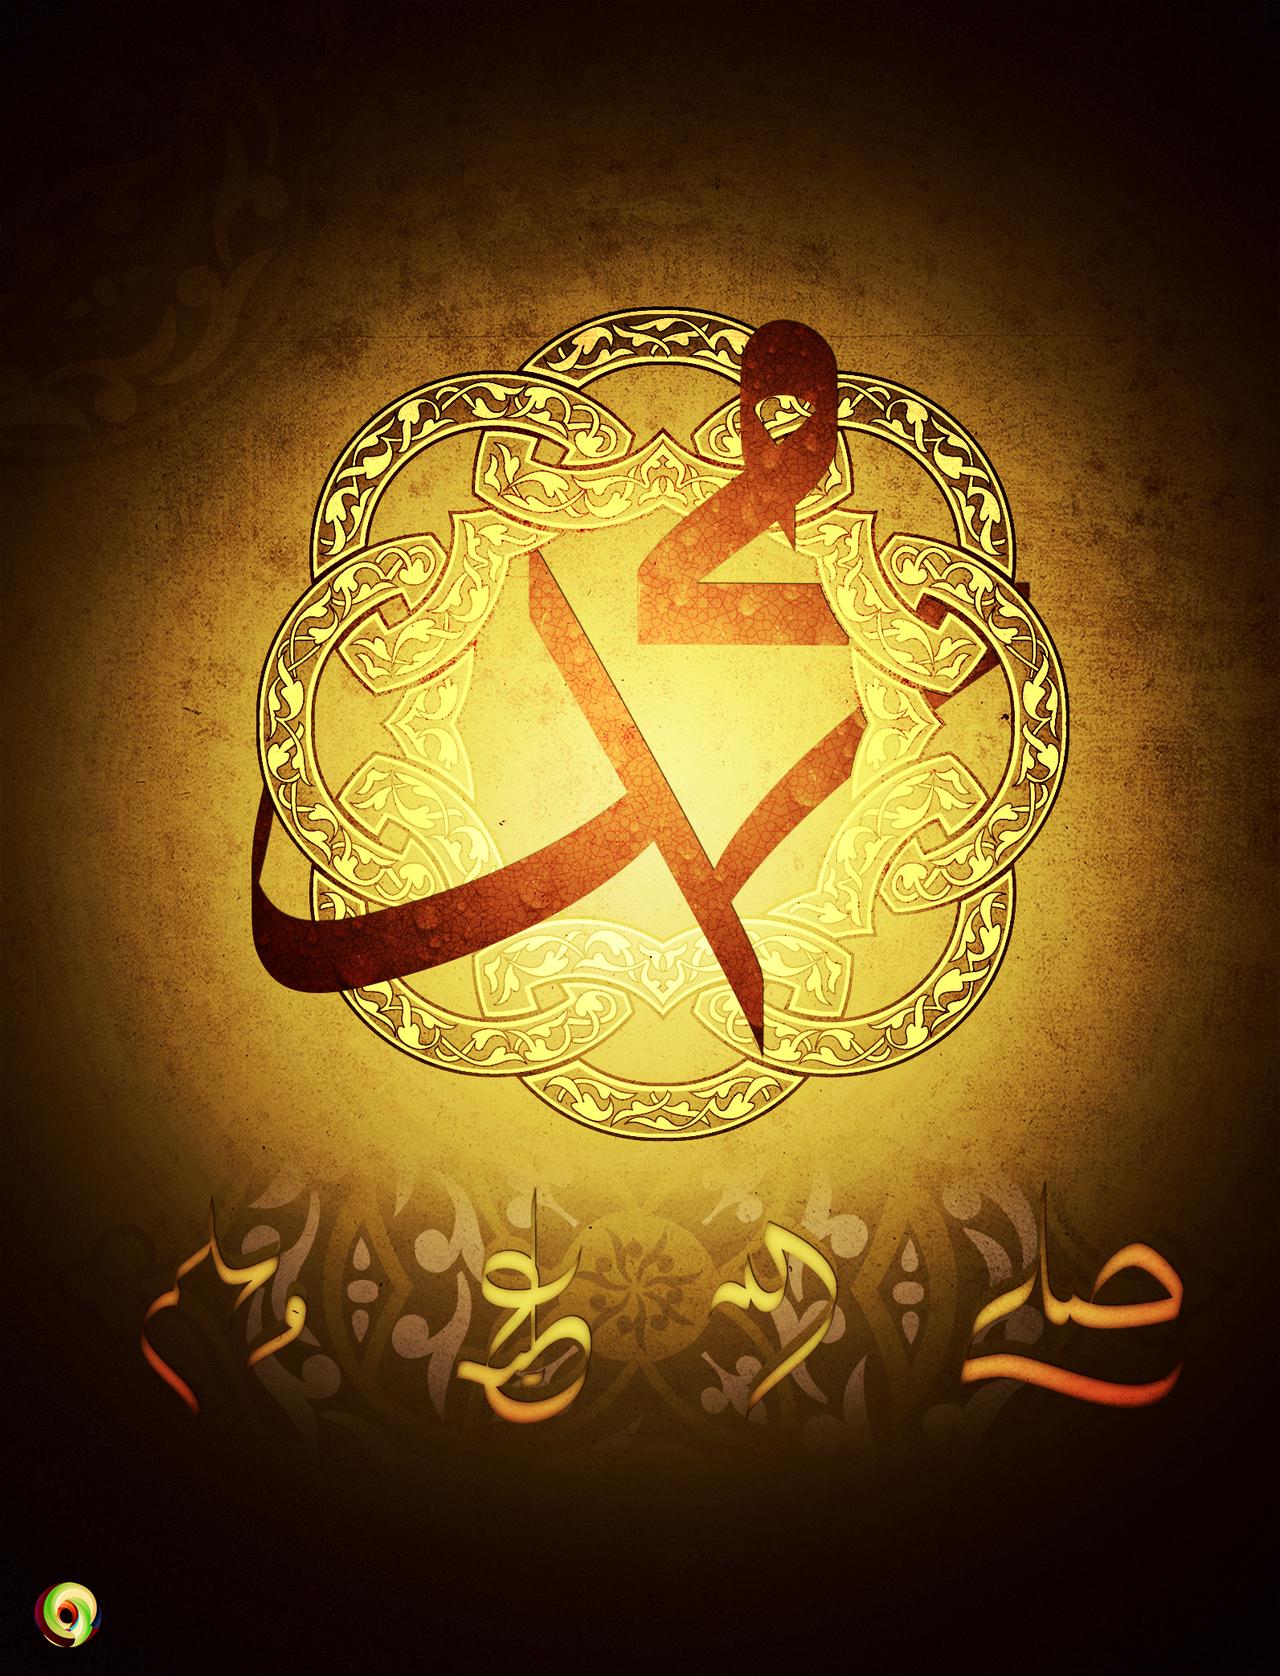 Mohamed Peace Be Upon Him By Bakergfxislamicdsner On Deviantart